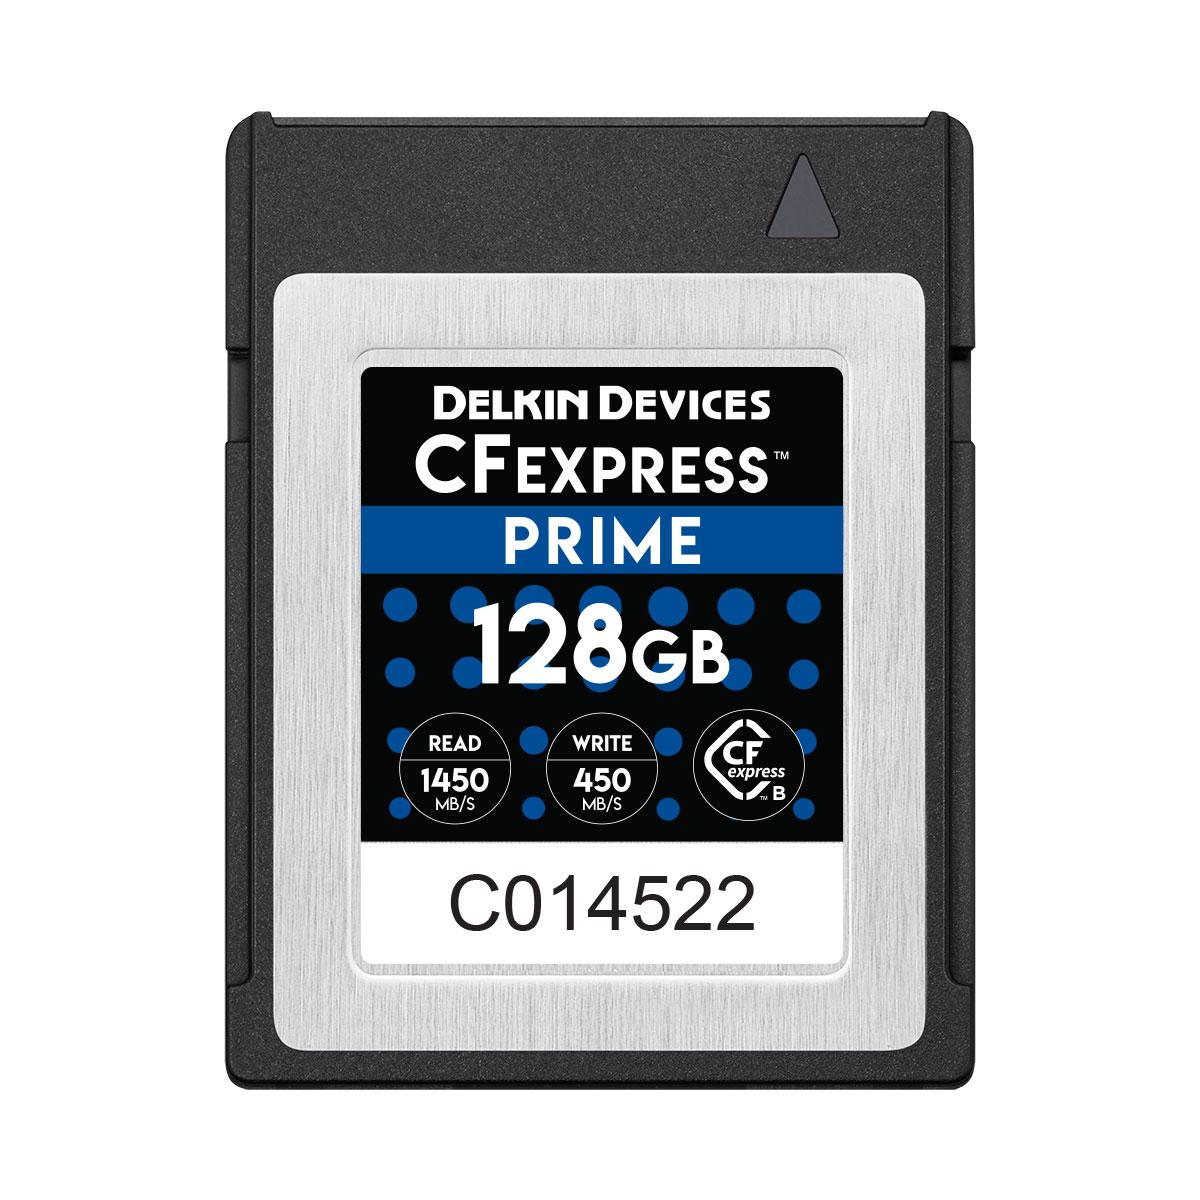 128GB CFexpress PRIME メモリーカード